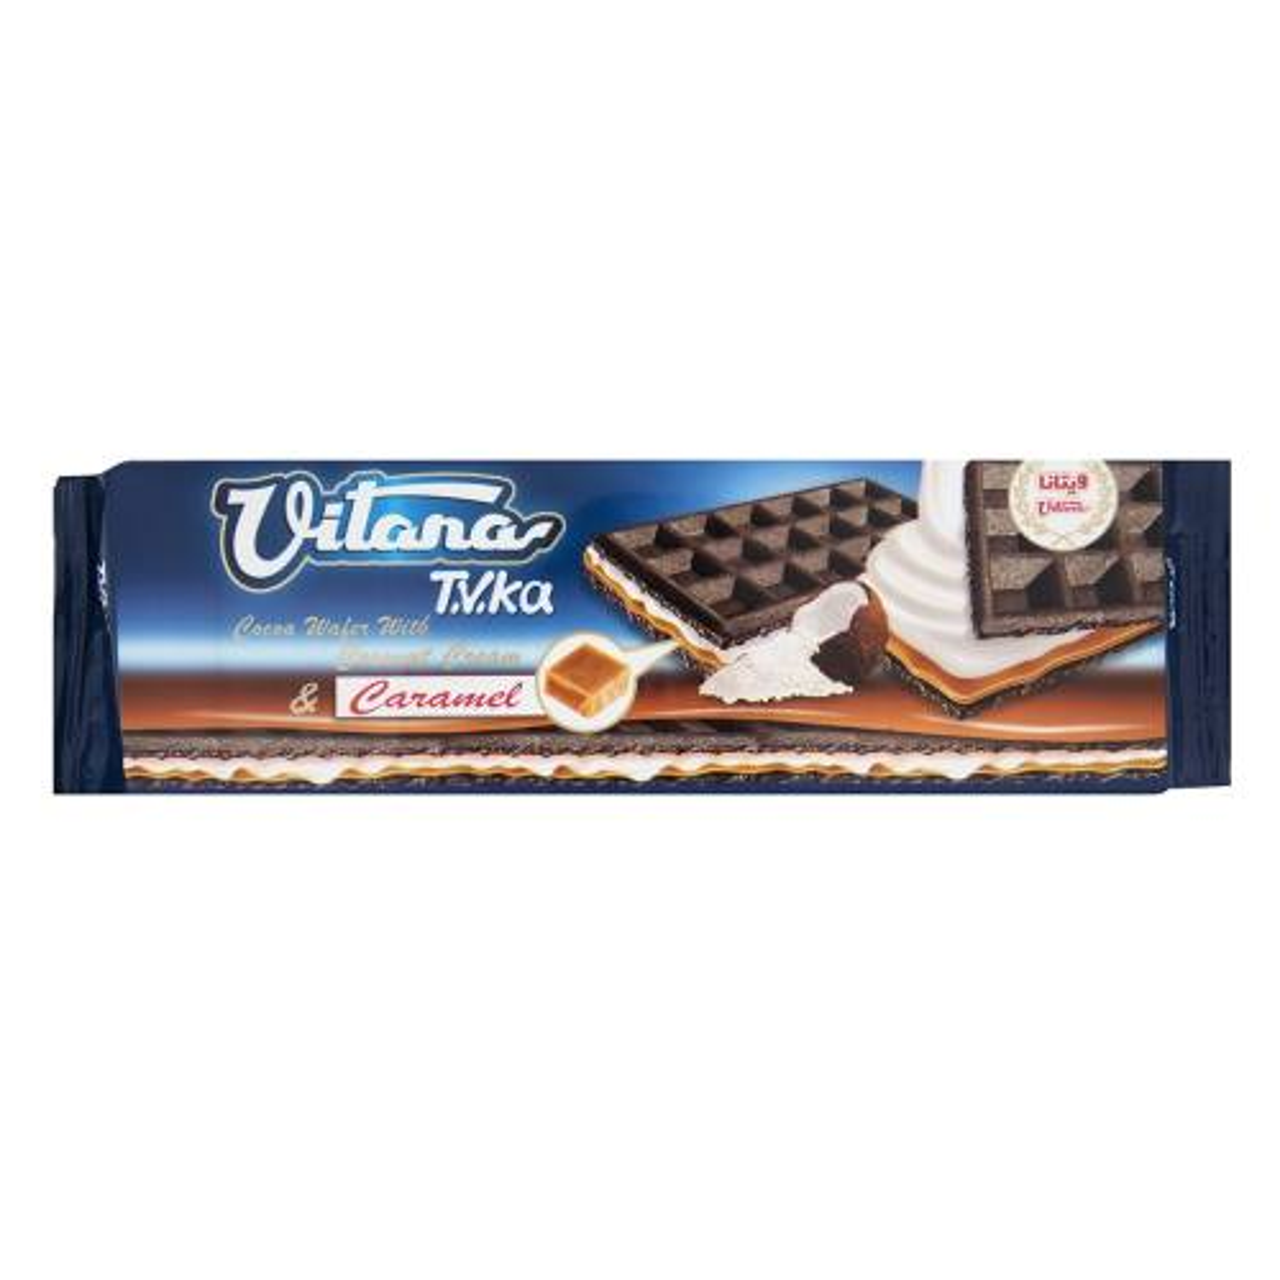 ویفر کاکائویی با لایه نازک کرم نارگیلی و کارامل ویتانا مقدار 200 گرم